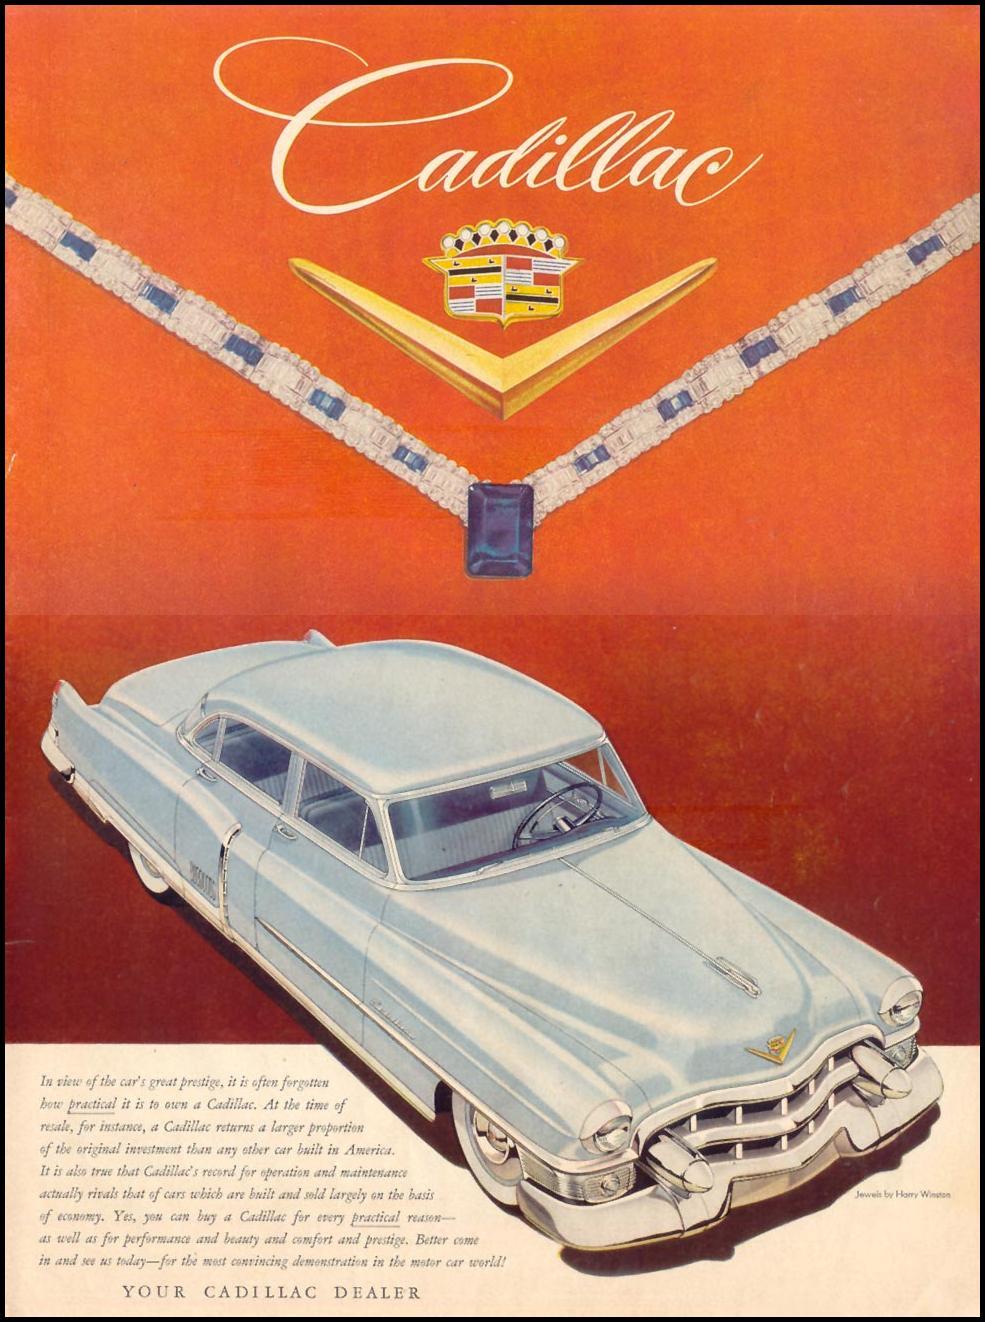 CADILLAC AUTOMOBILES LIFE 07/06/1953 p. 5